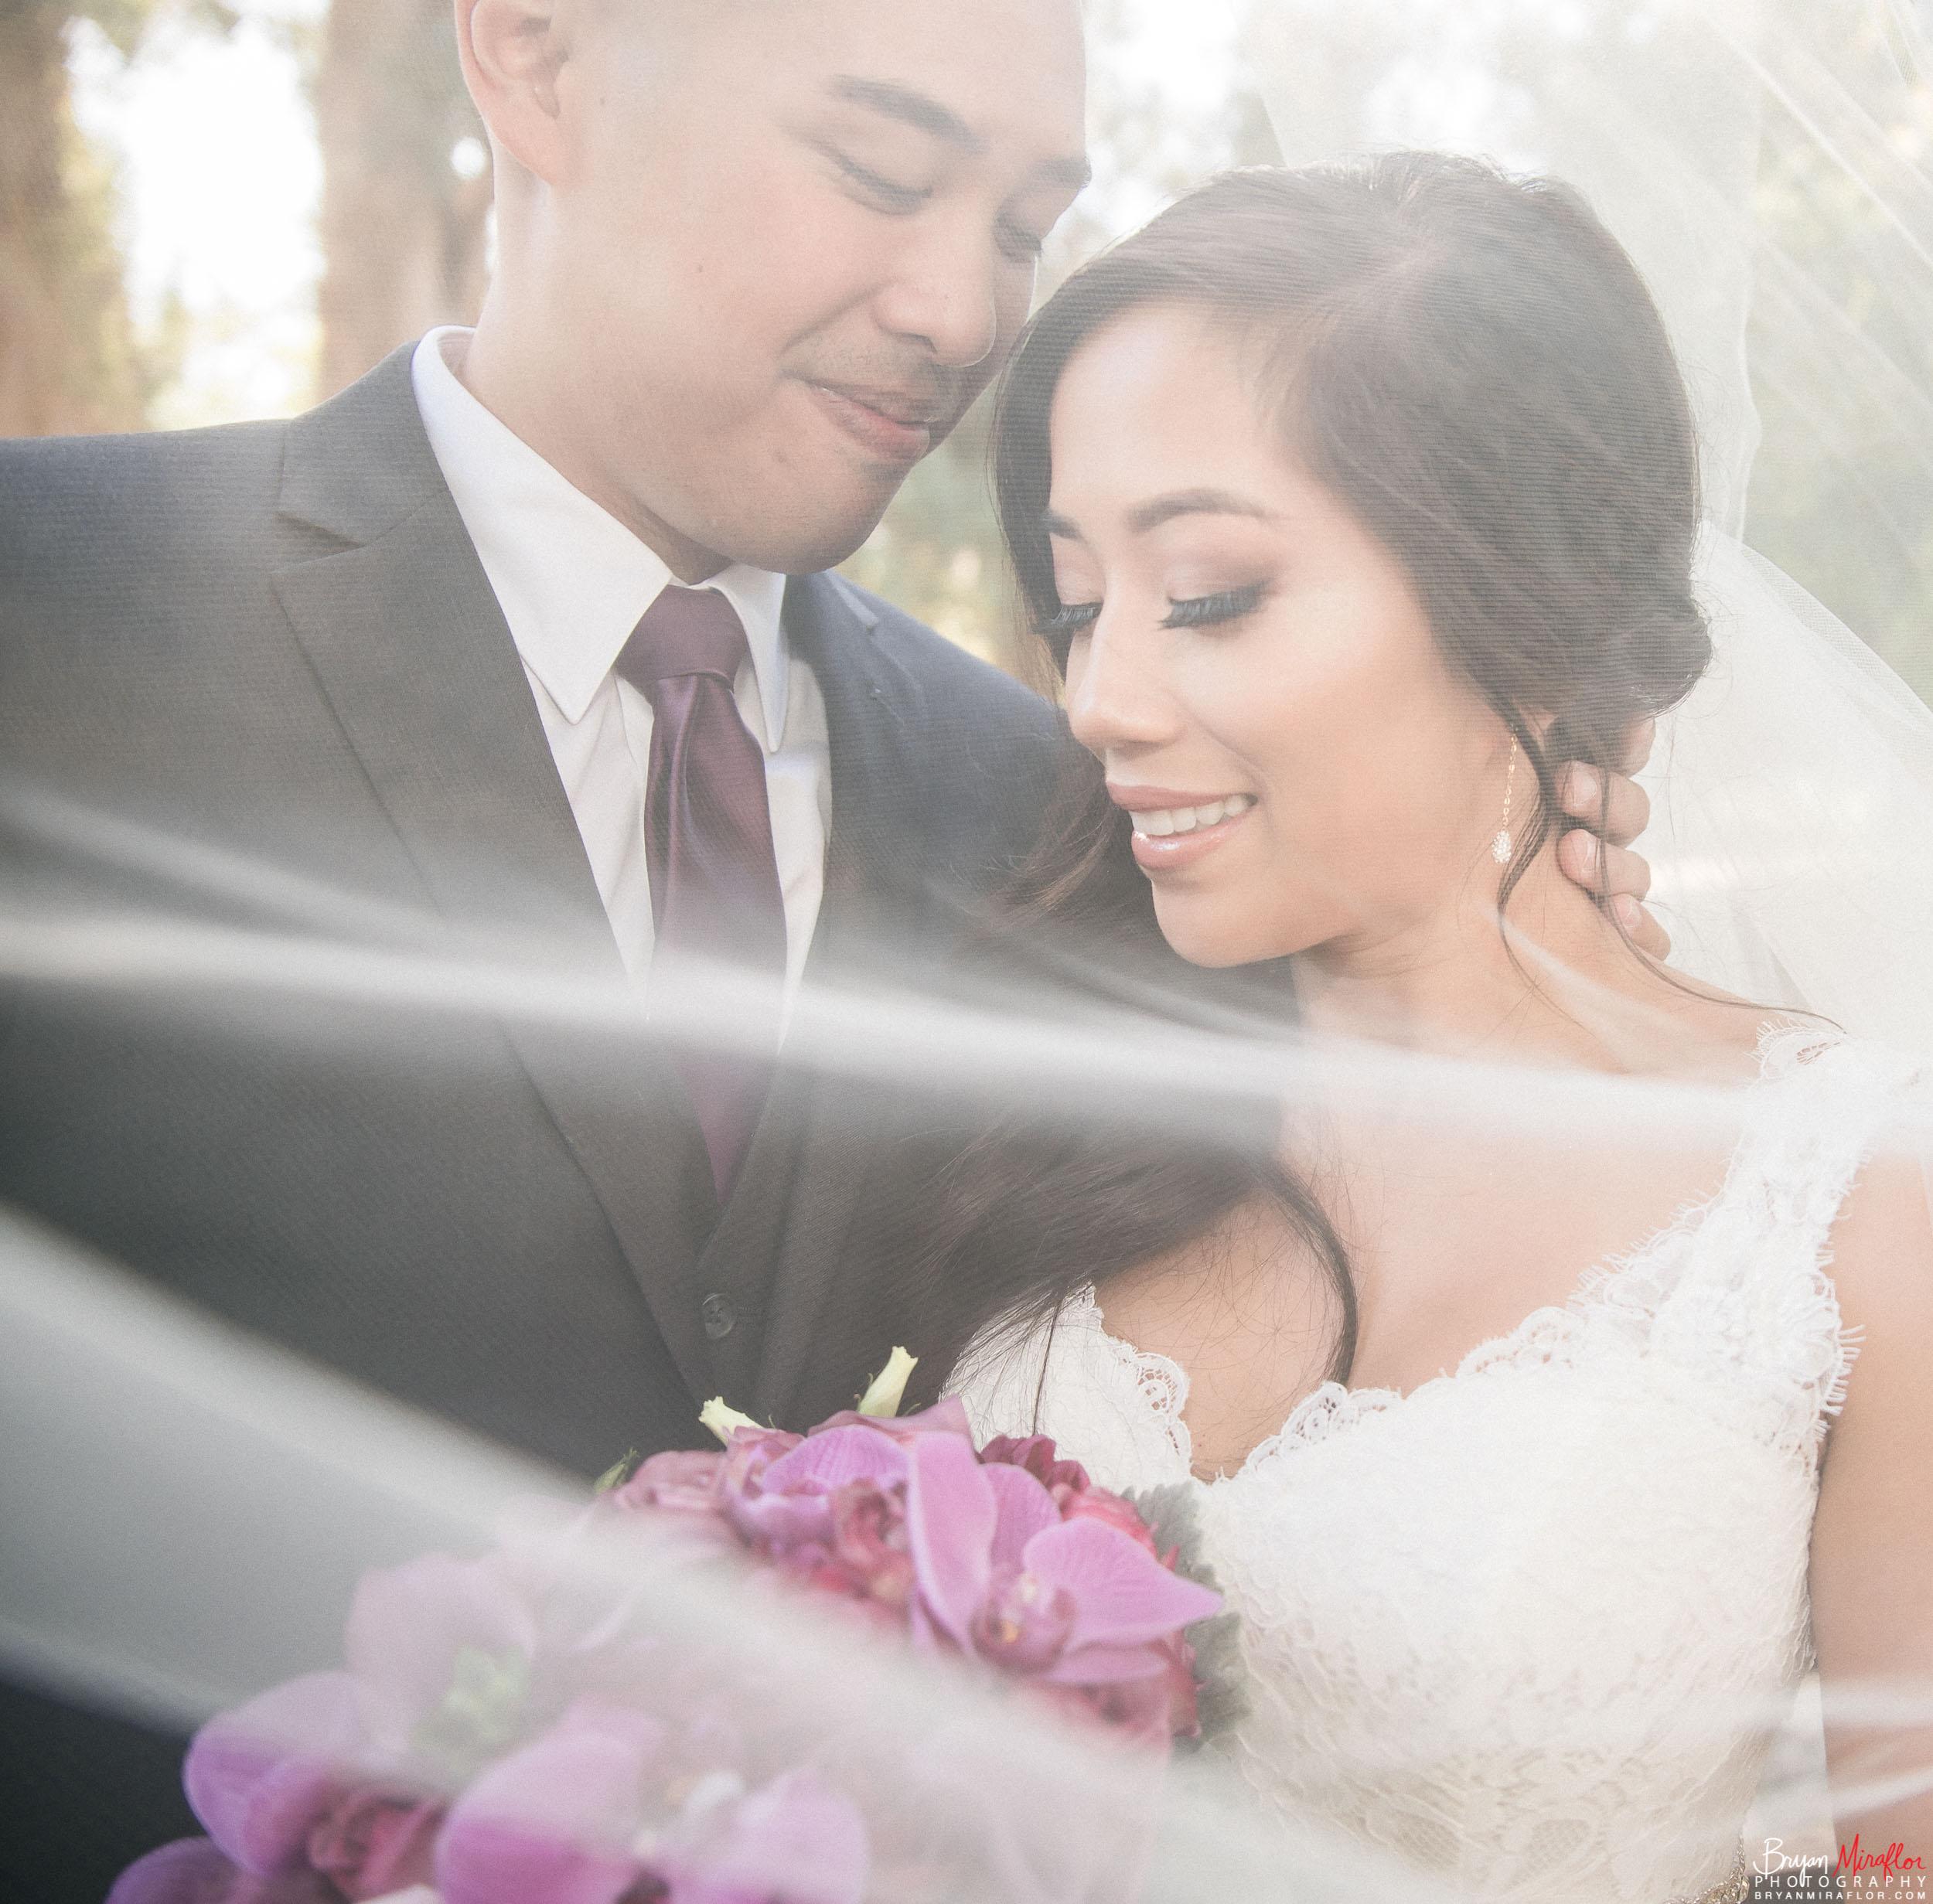 Bryan-Miraflor-Photography-Trisha-Dexter-Married-20170923-040.jpg